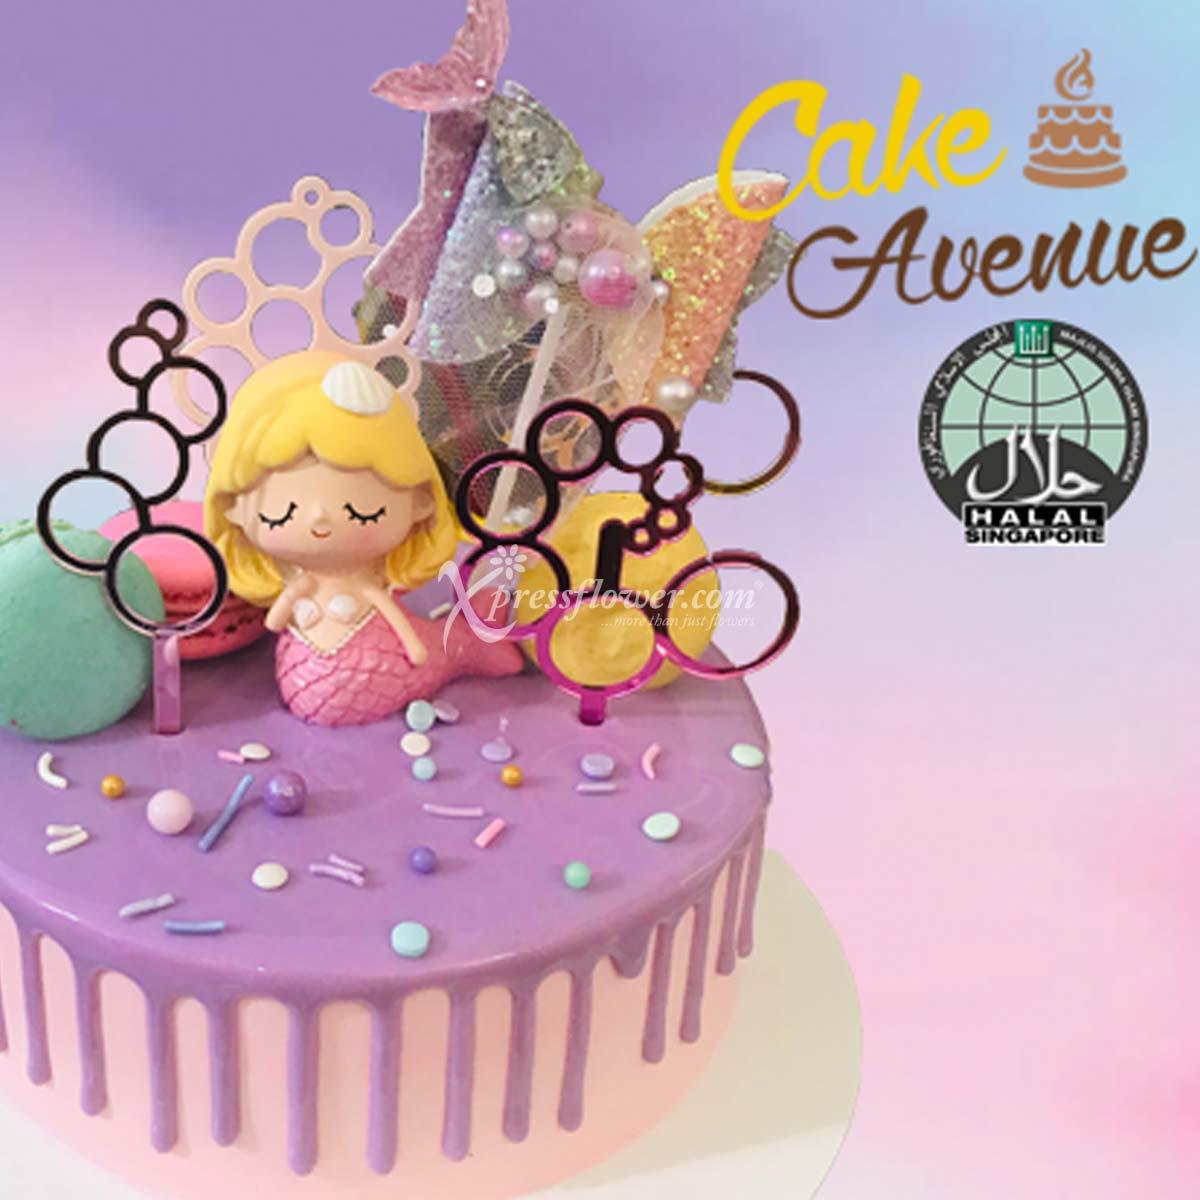 Happy Birthday - Mermaid (Cake Avenue)